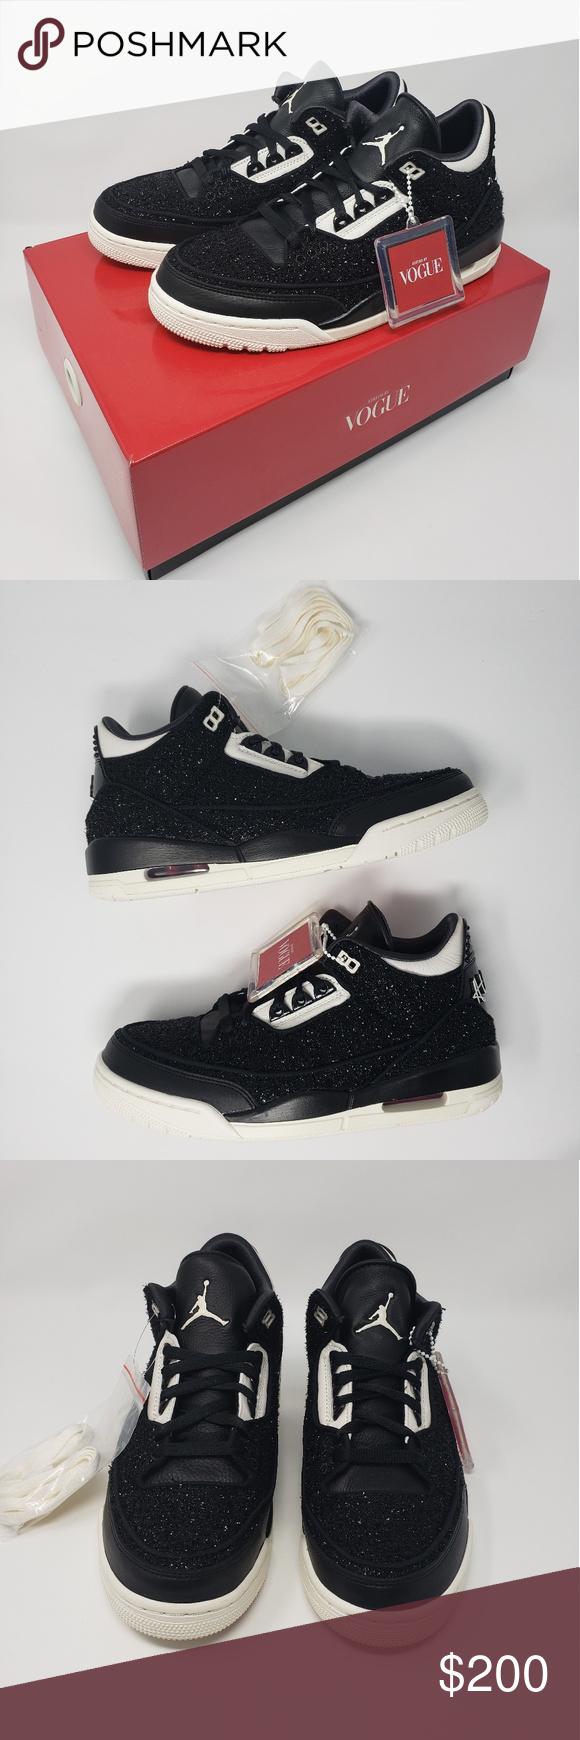 buy online 63838 6805f Women's Nike Air Jordan 3 Retro SE AWOK ITEM: WMNS Nike Air Jordan 3 Retro